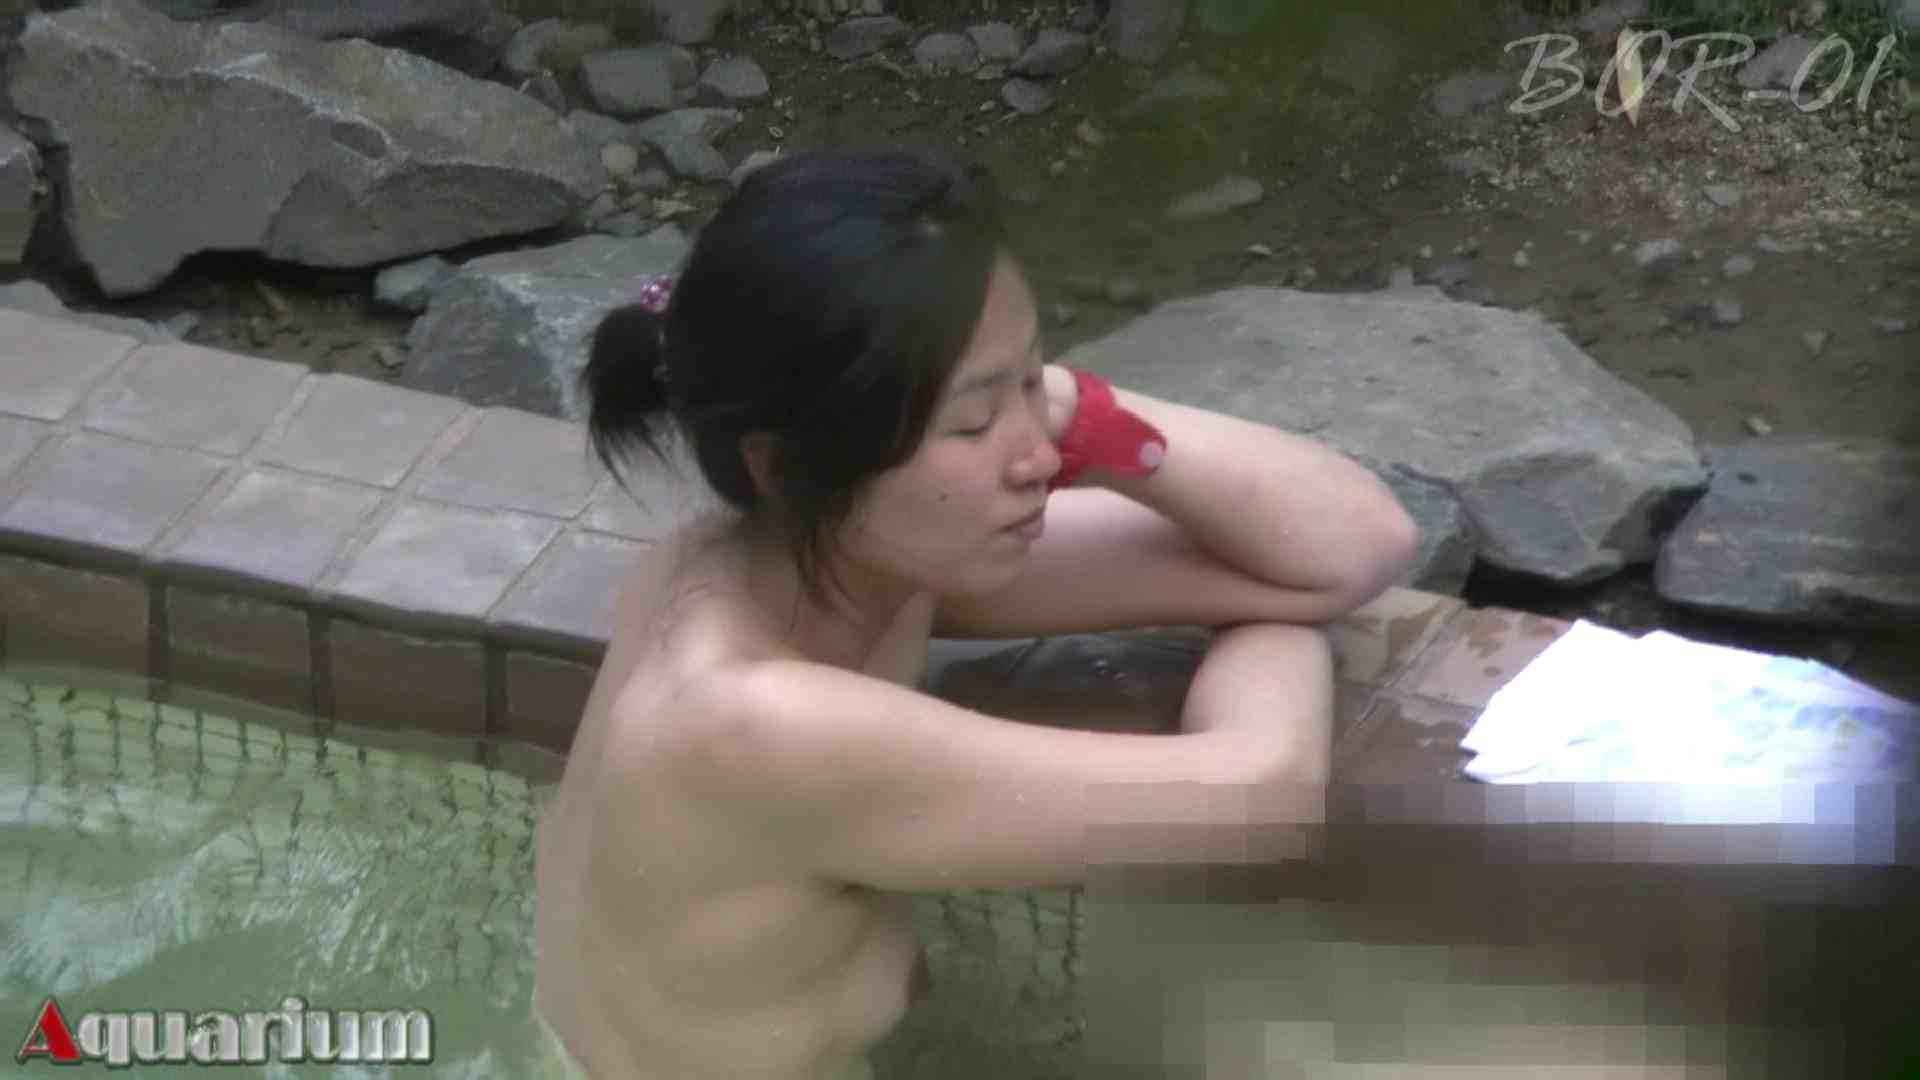 Aquaな露天風呂Vol.465 盗撮 盗み撮り動画キャプチャ 51画像 11